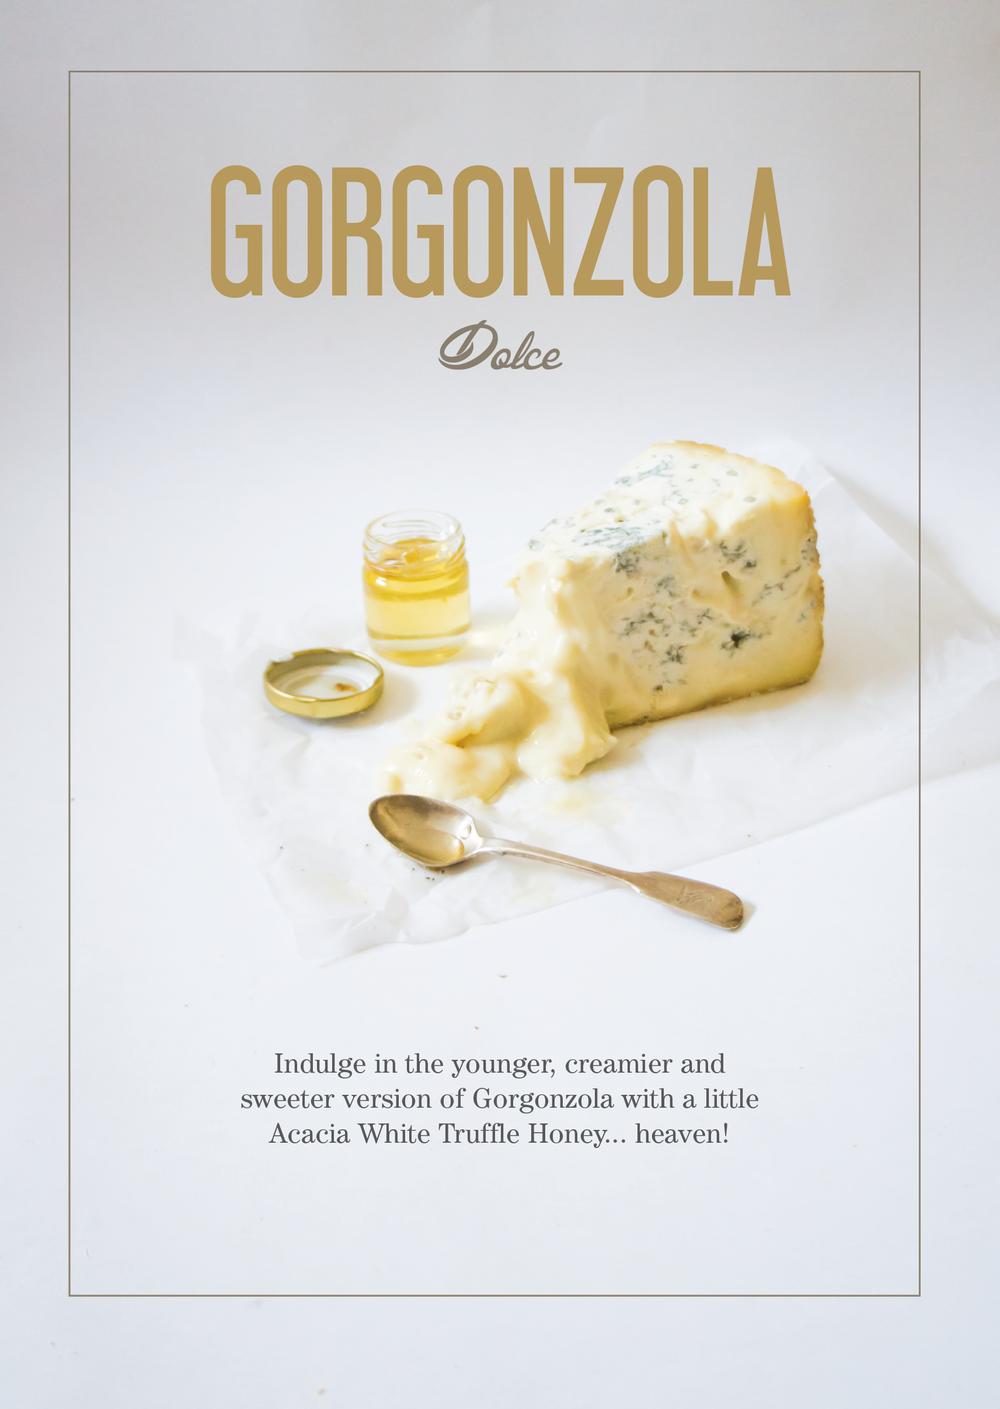 Gorgonzola.png